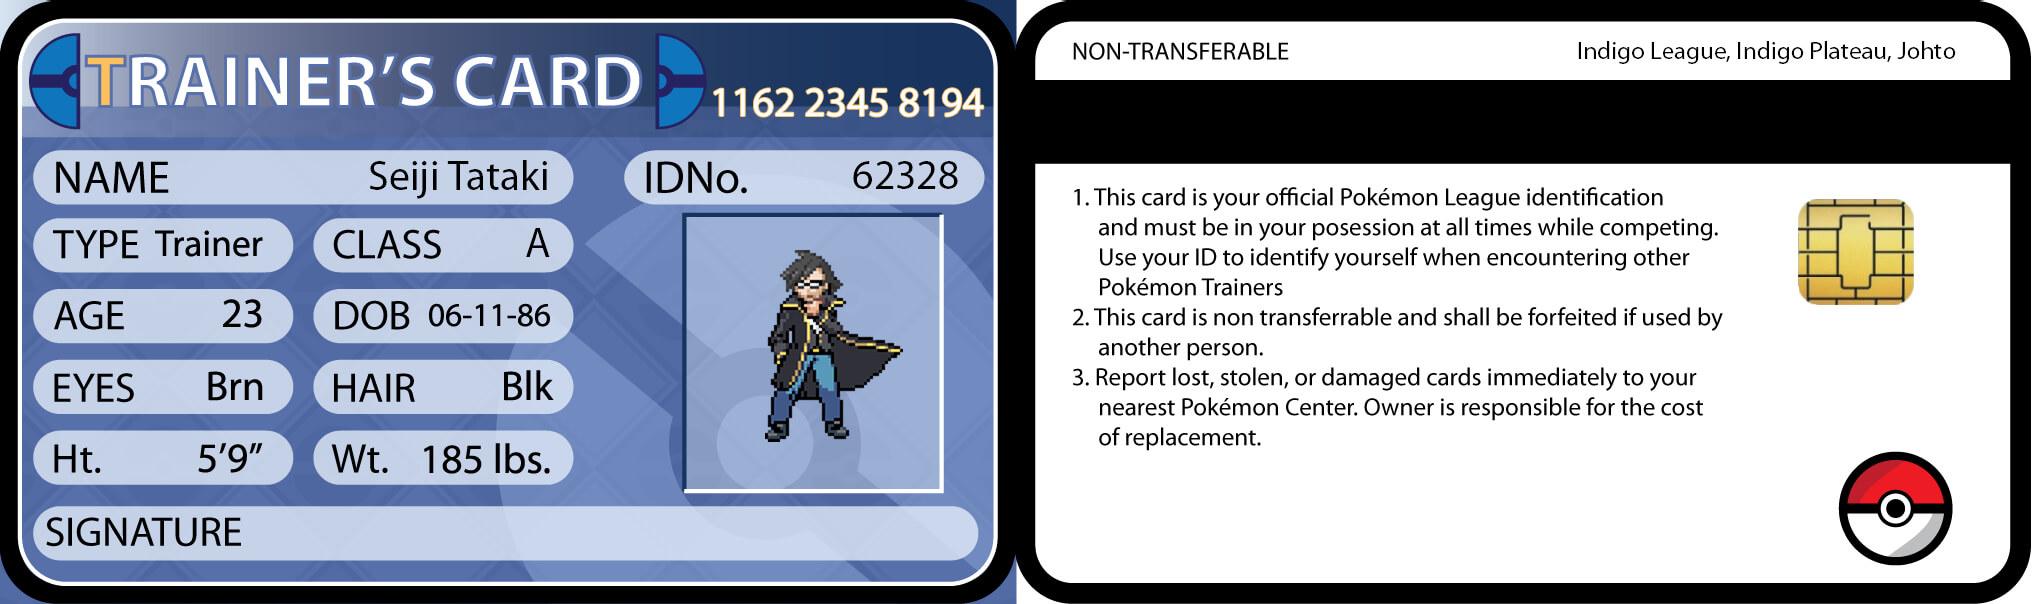 Pokemon Trainer Cardseijitataki On Deviantart Inside Pokemon Trainer Card Template